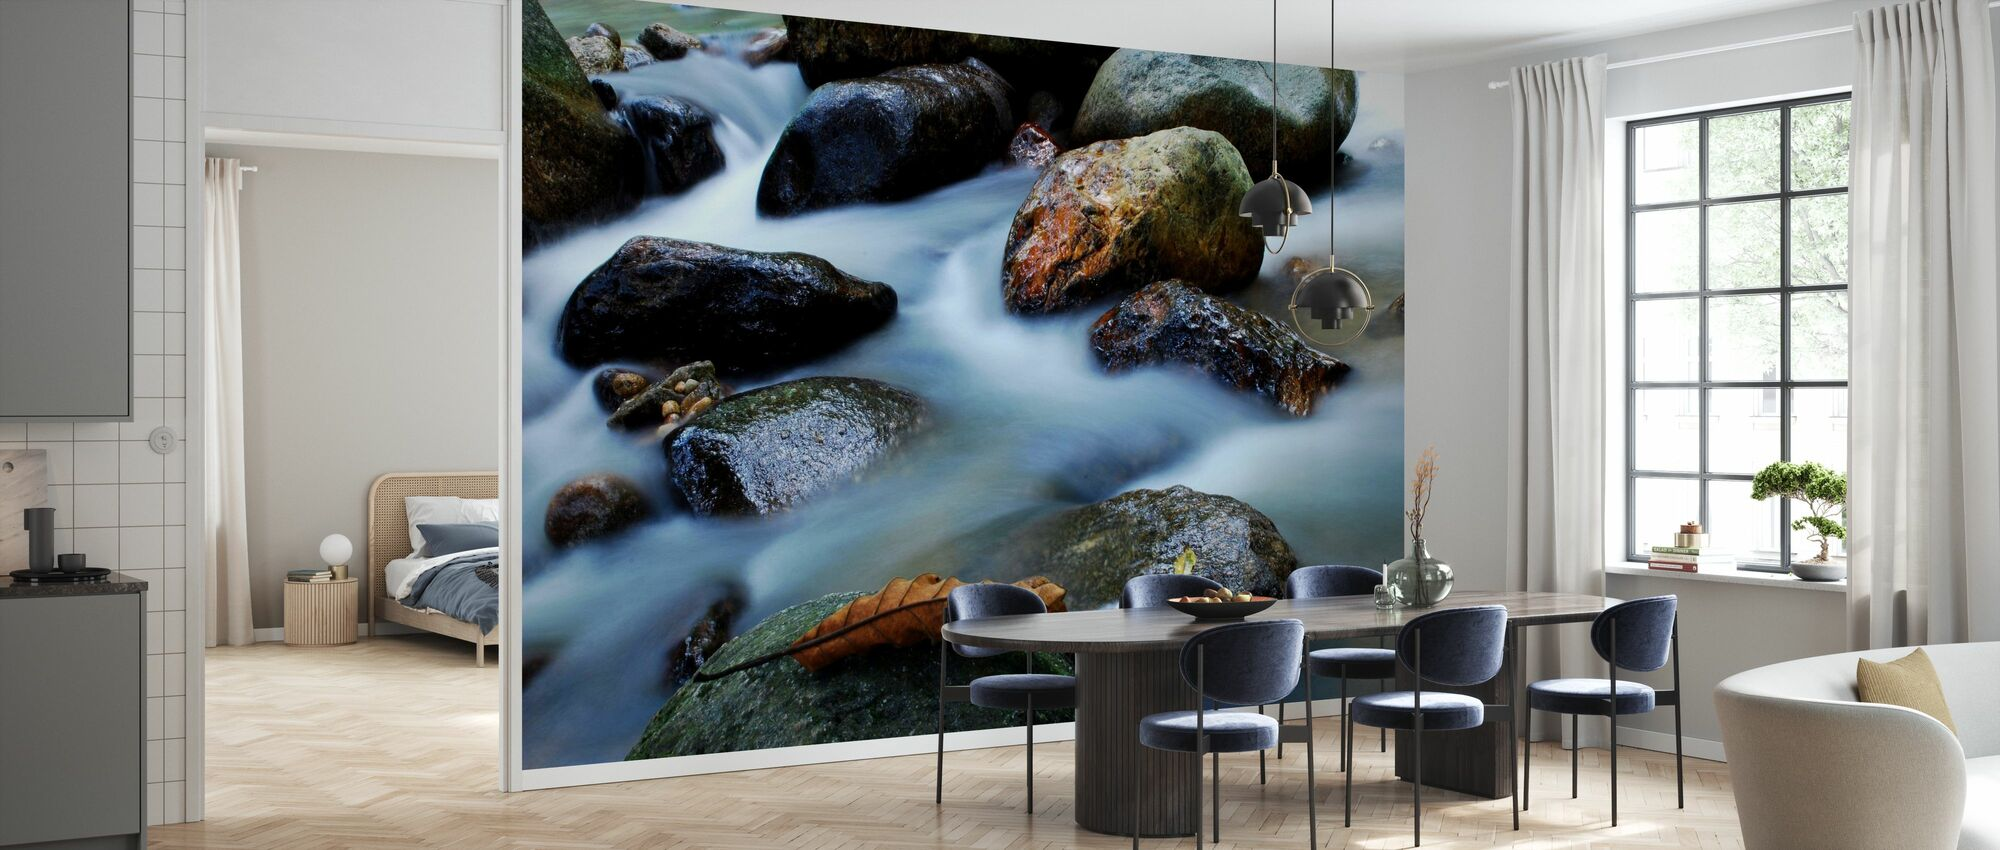 Waterfall Close Up - Wallpaper - Kitchen